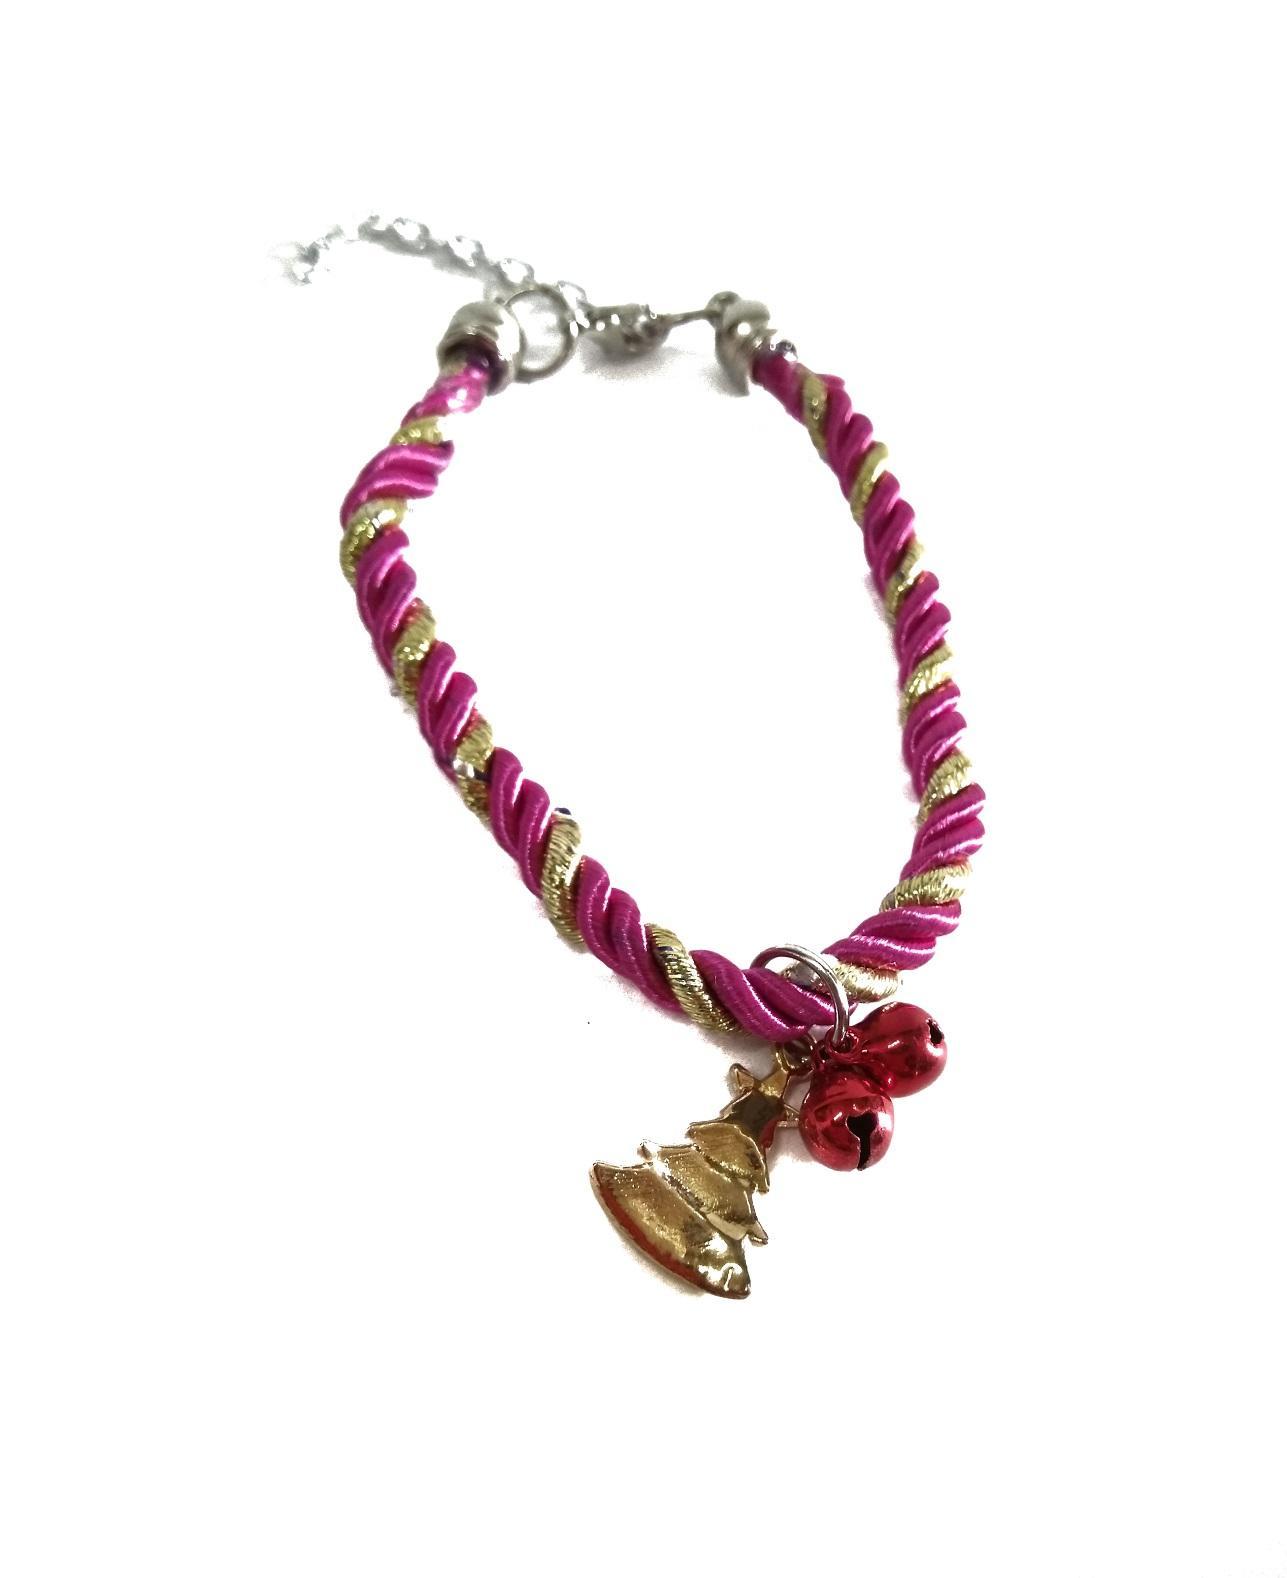 Kalung Anjing Kucing Tali kepang dengan dua kerincing kecil